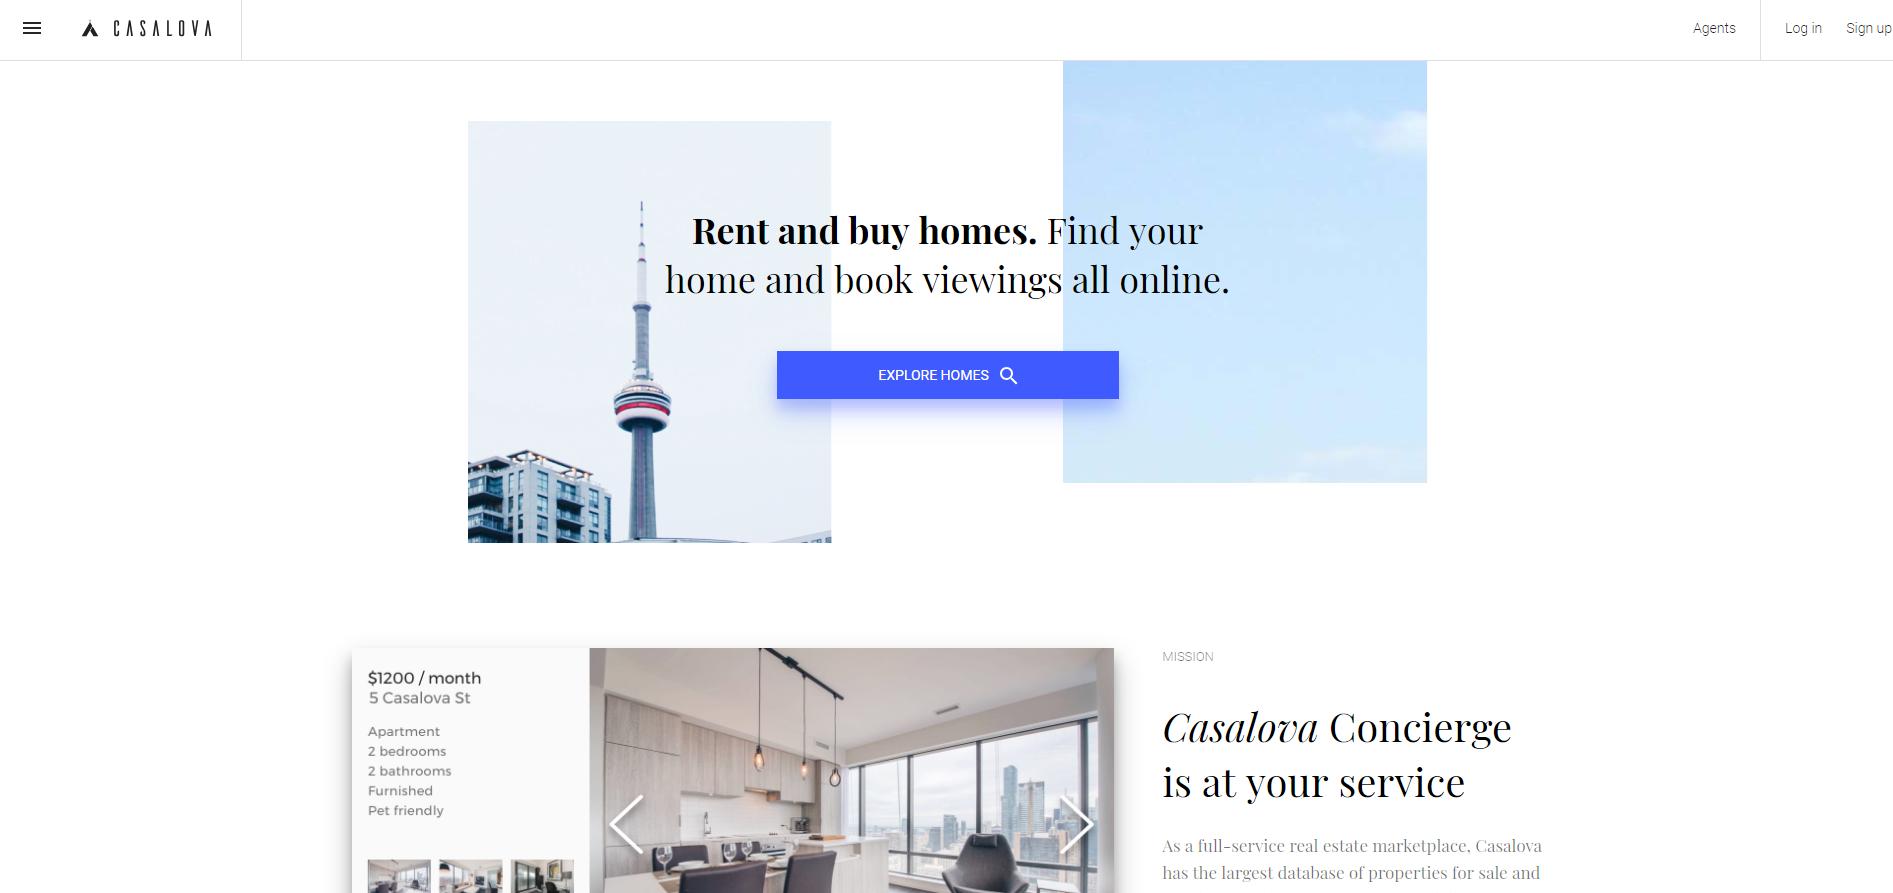 Rental home website (https://www casalova com/) by *Pink